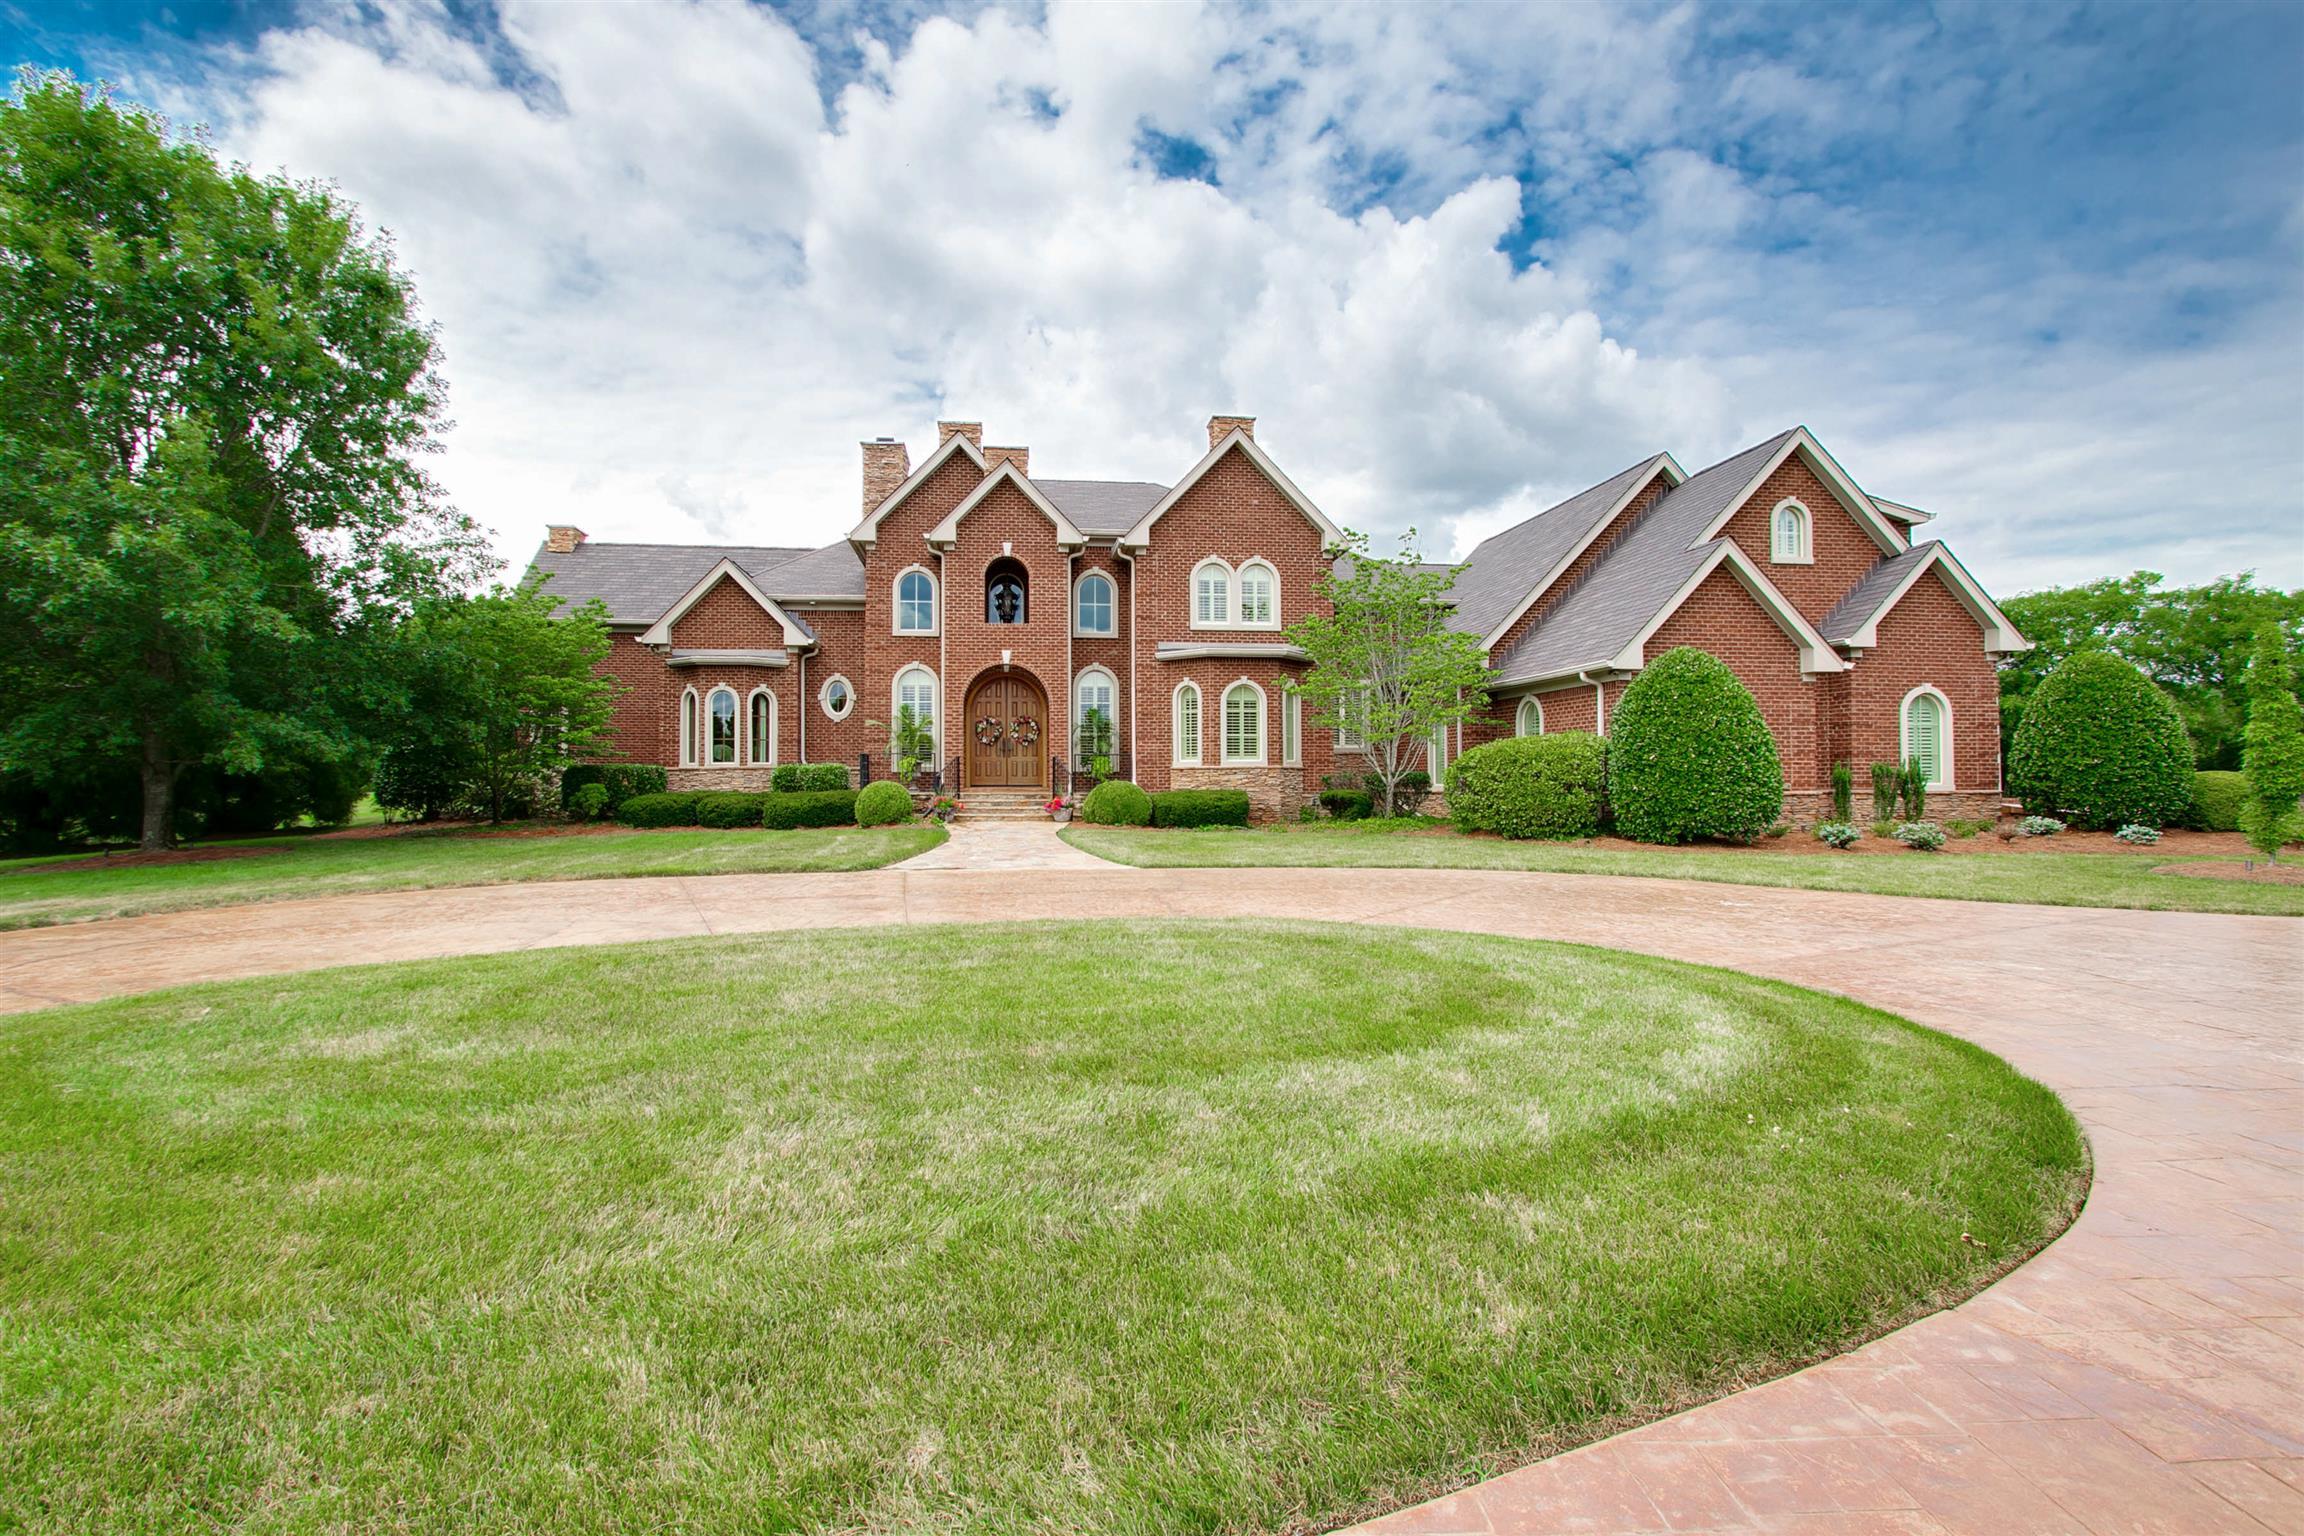 510 Davis Rd, Lebanon, TN 37087 - Lebanon, TN real estate listing